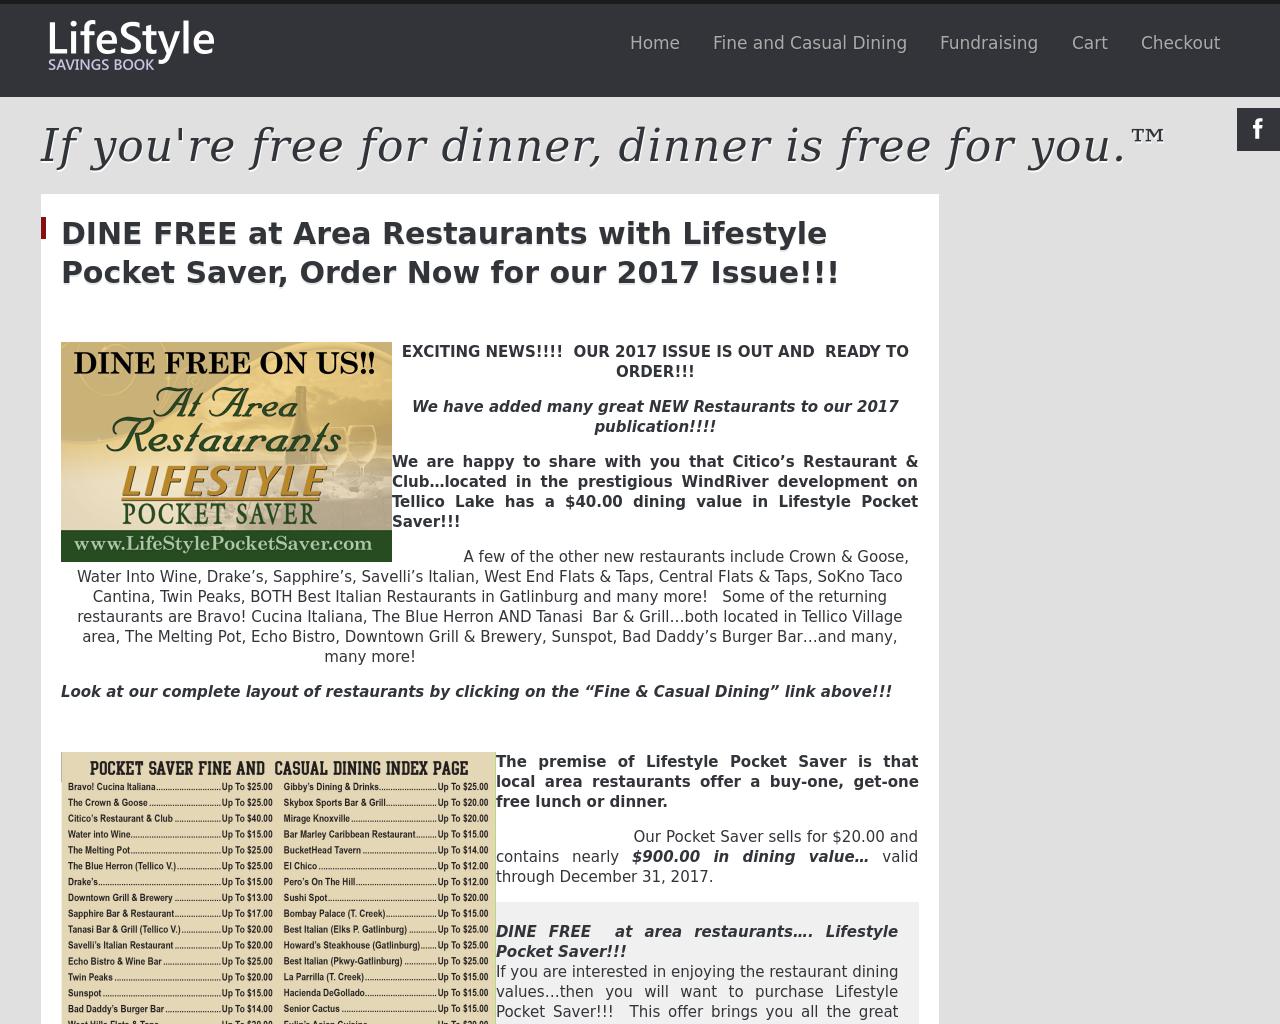 LifeStyle-Savings-Book-Advertising-Reviews-Pricing